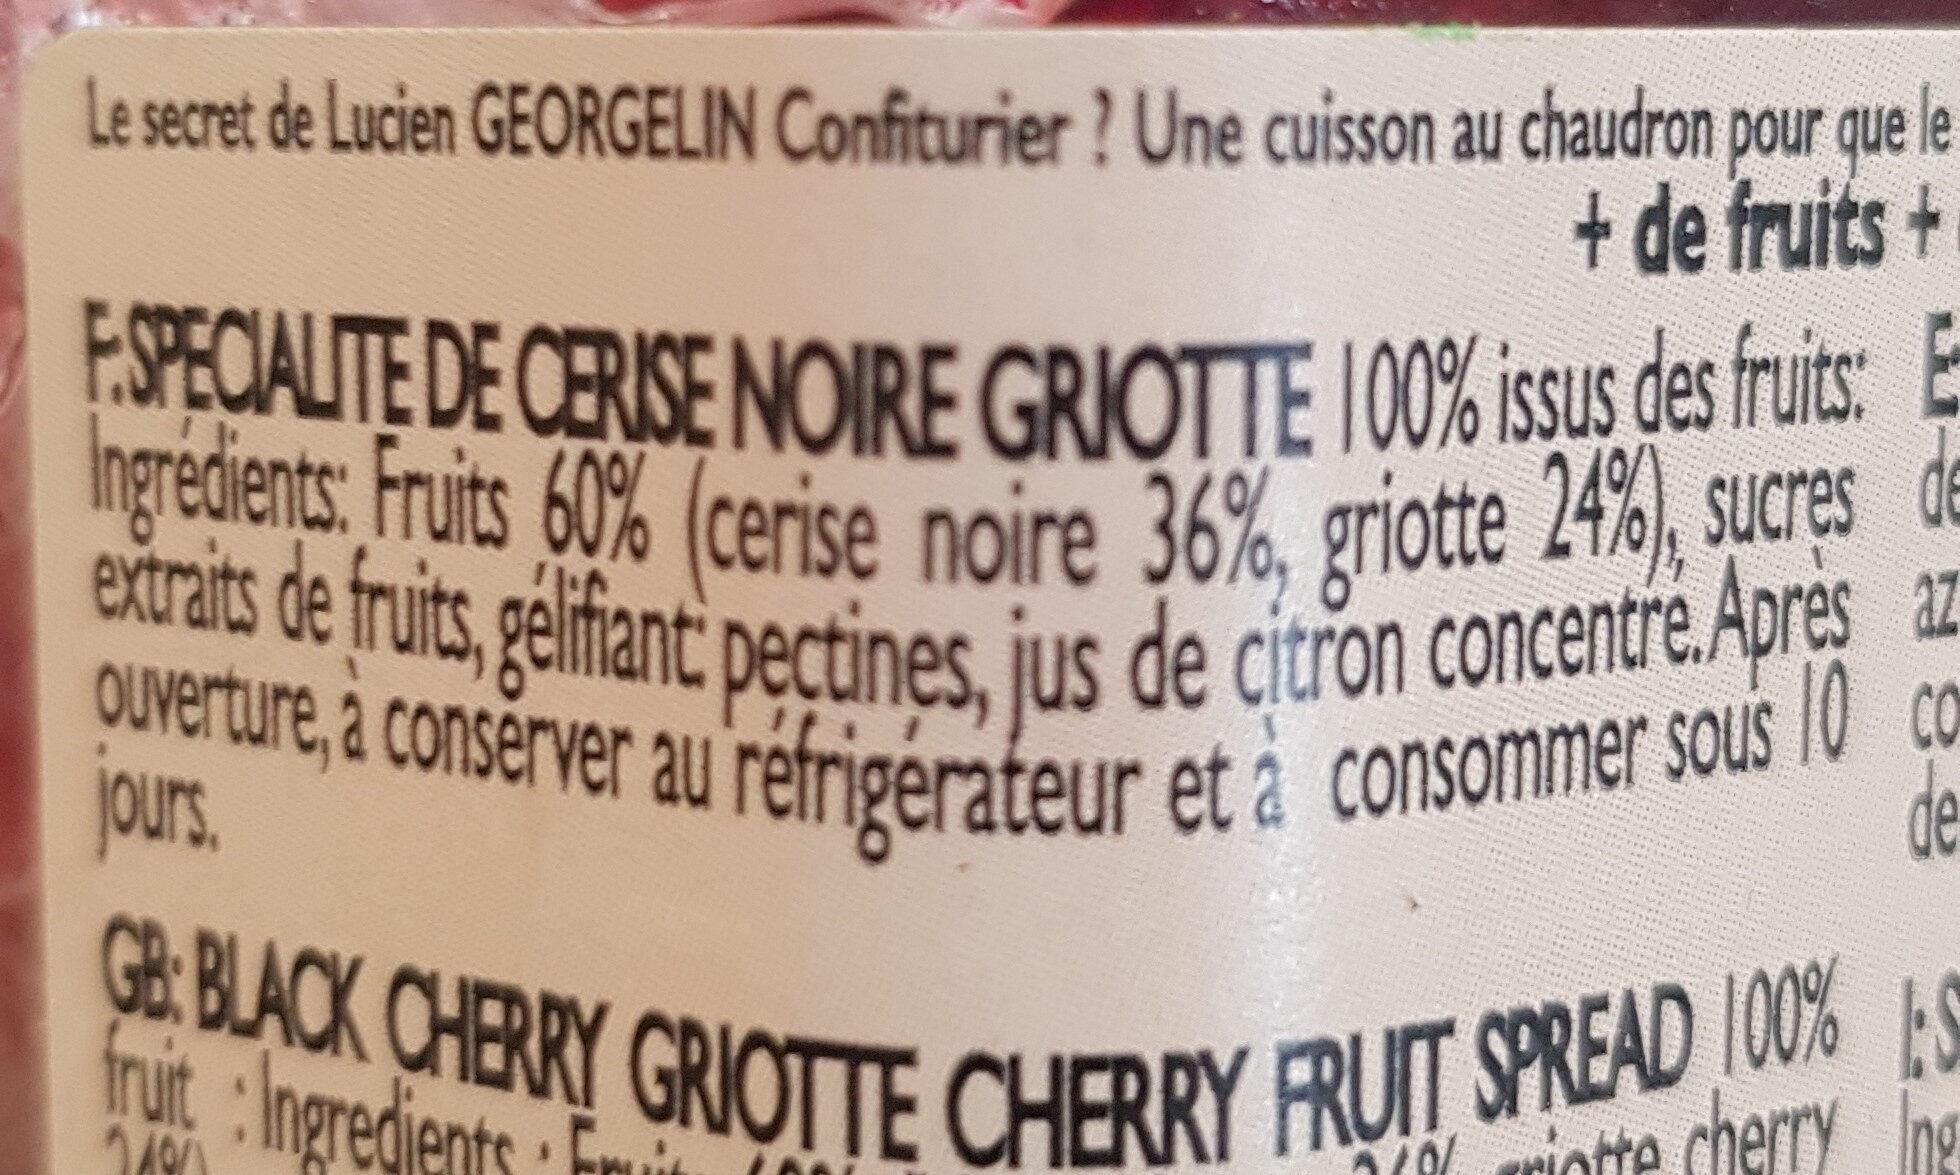 Cerise noire griotte - Ingrediënten - fr